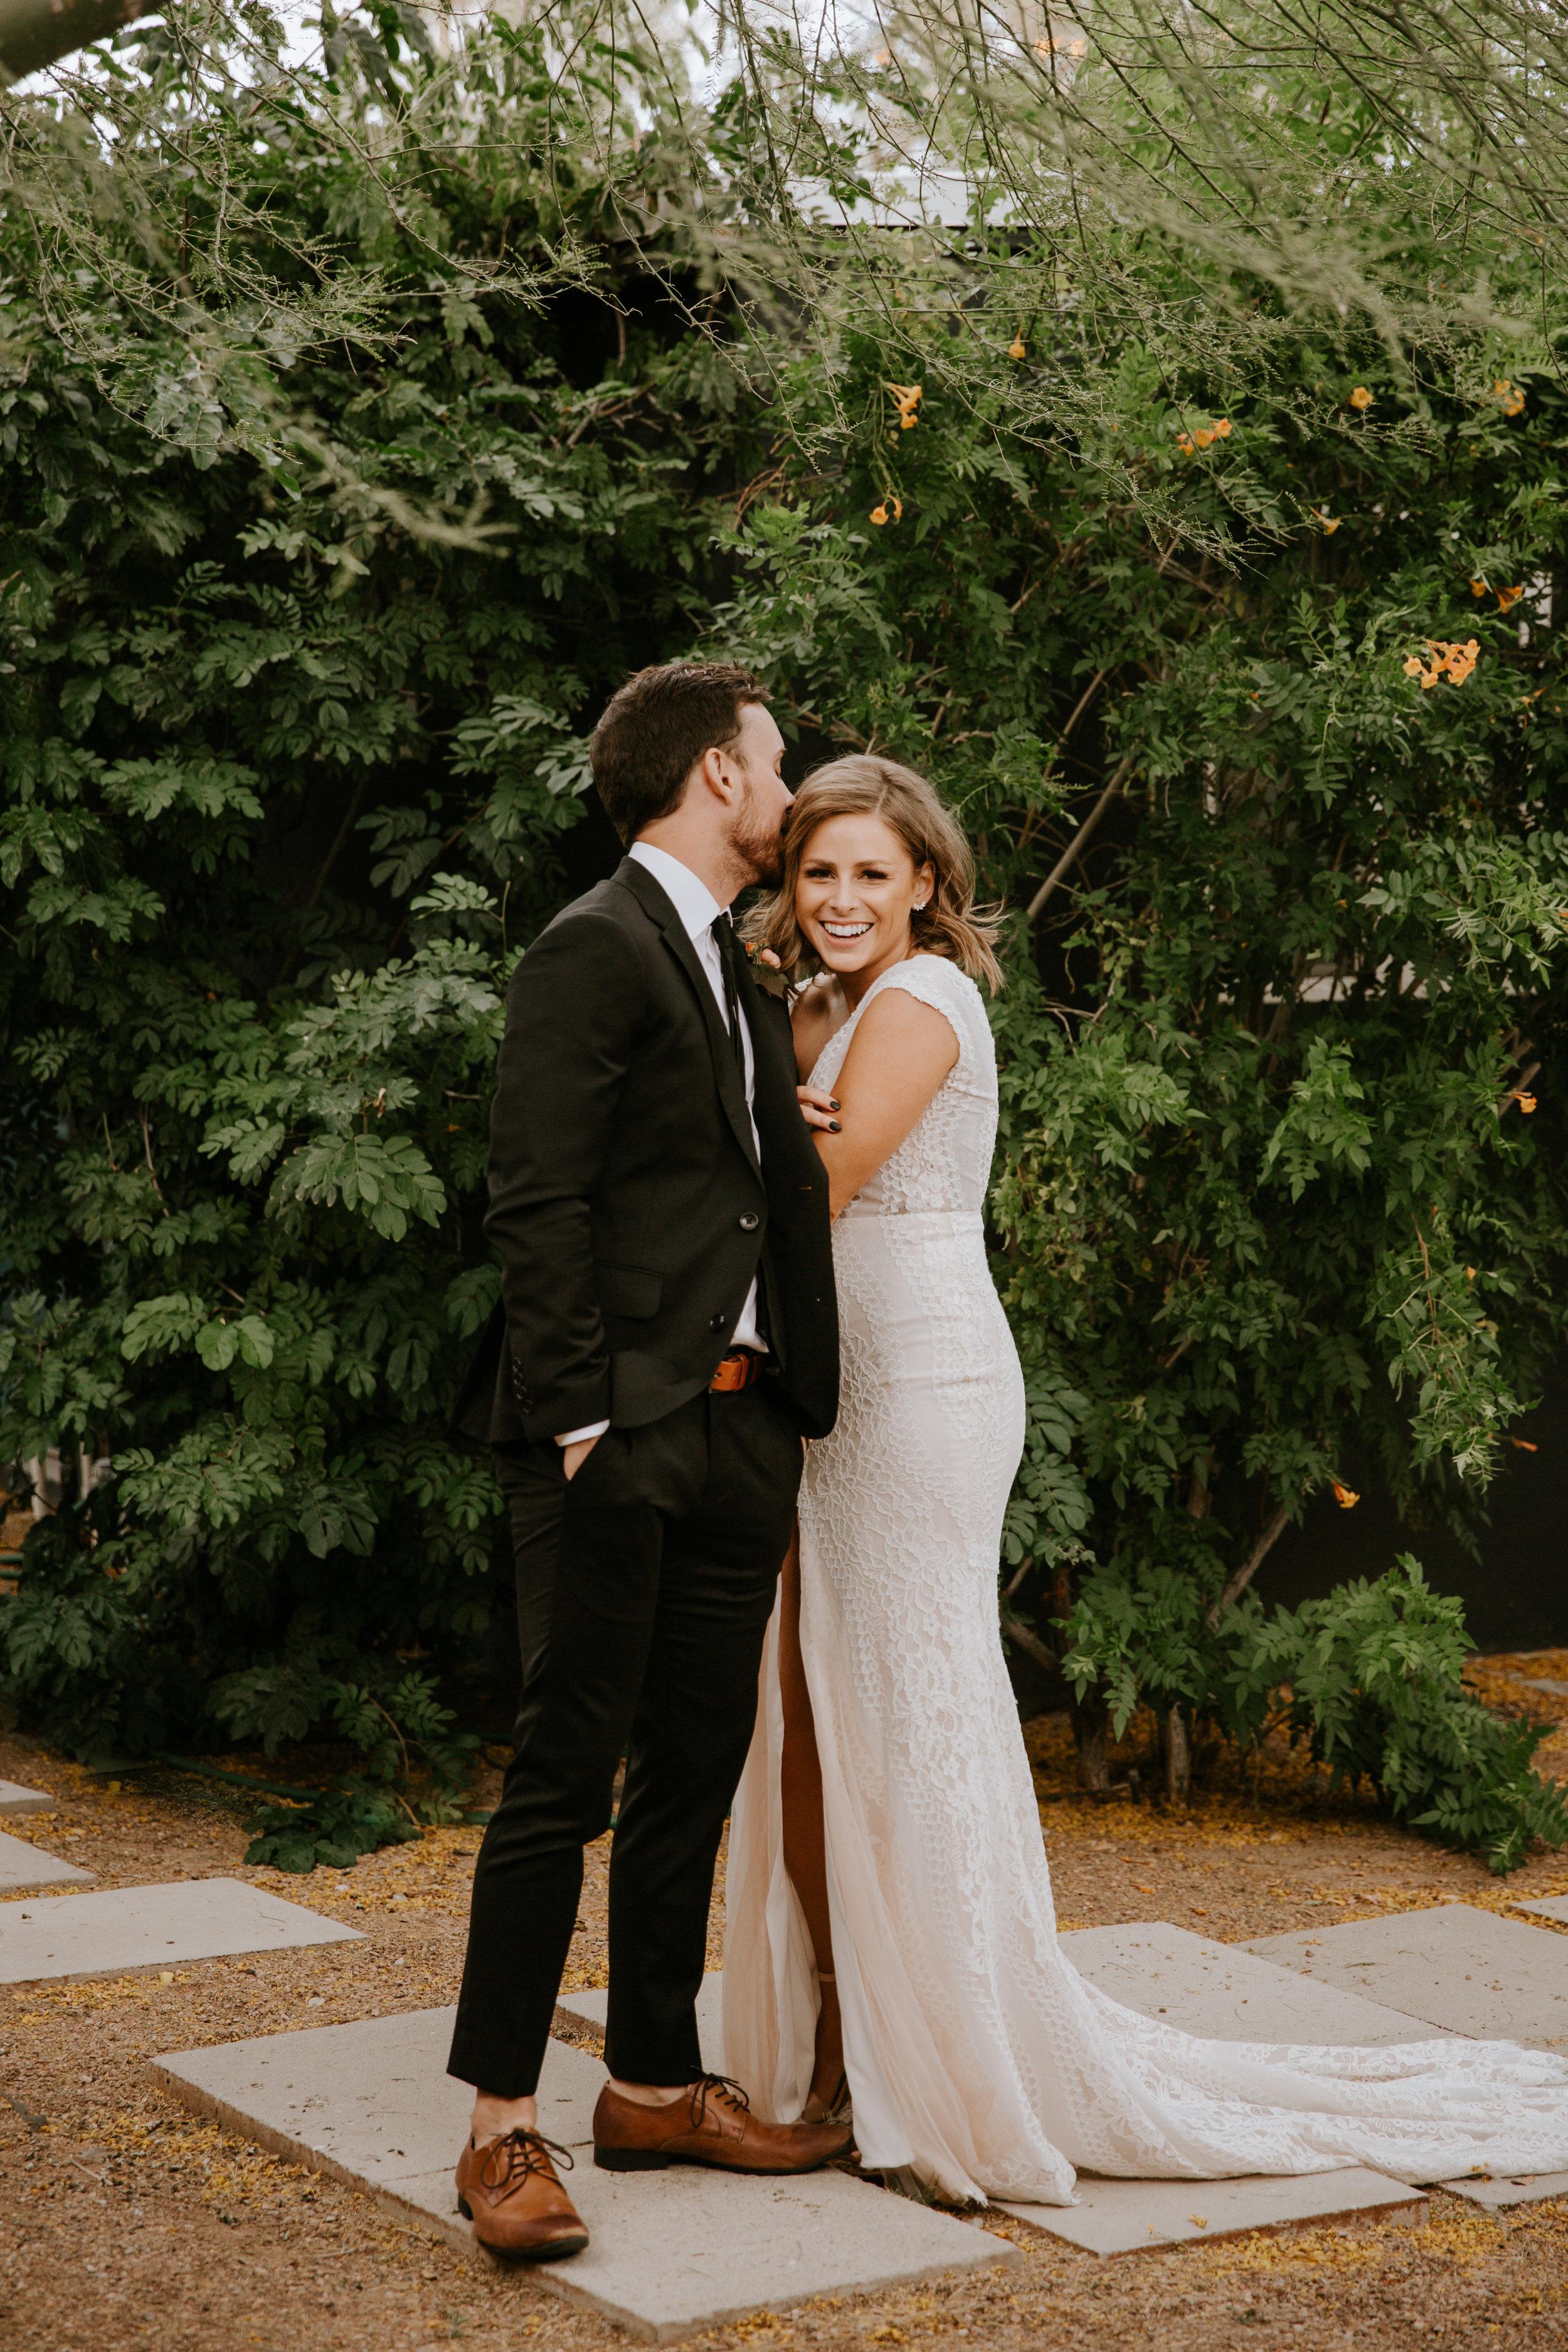 2019-05-26_Callie-Evan_Wedding_Joshua Tree_Paige Nelson_PREVIEWS HR-23.jpg